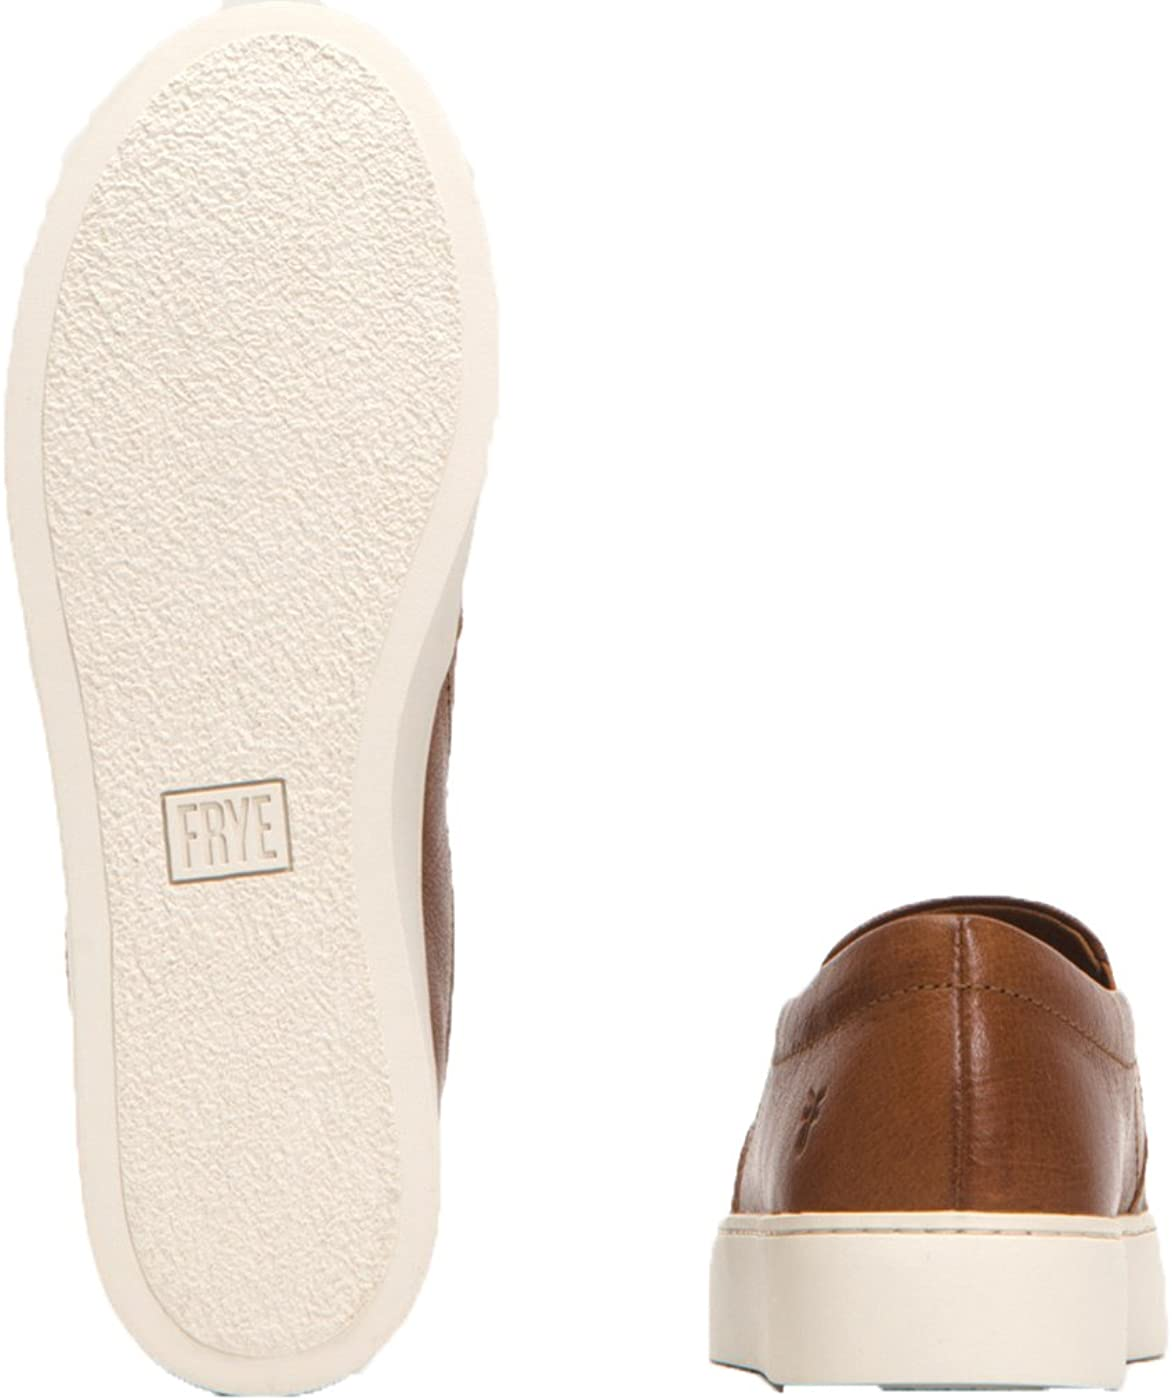 FRYE Womens Lena Slip On Shoes 3471292-Blk